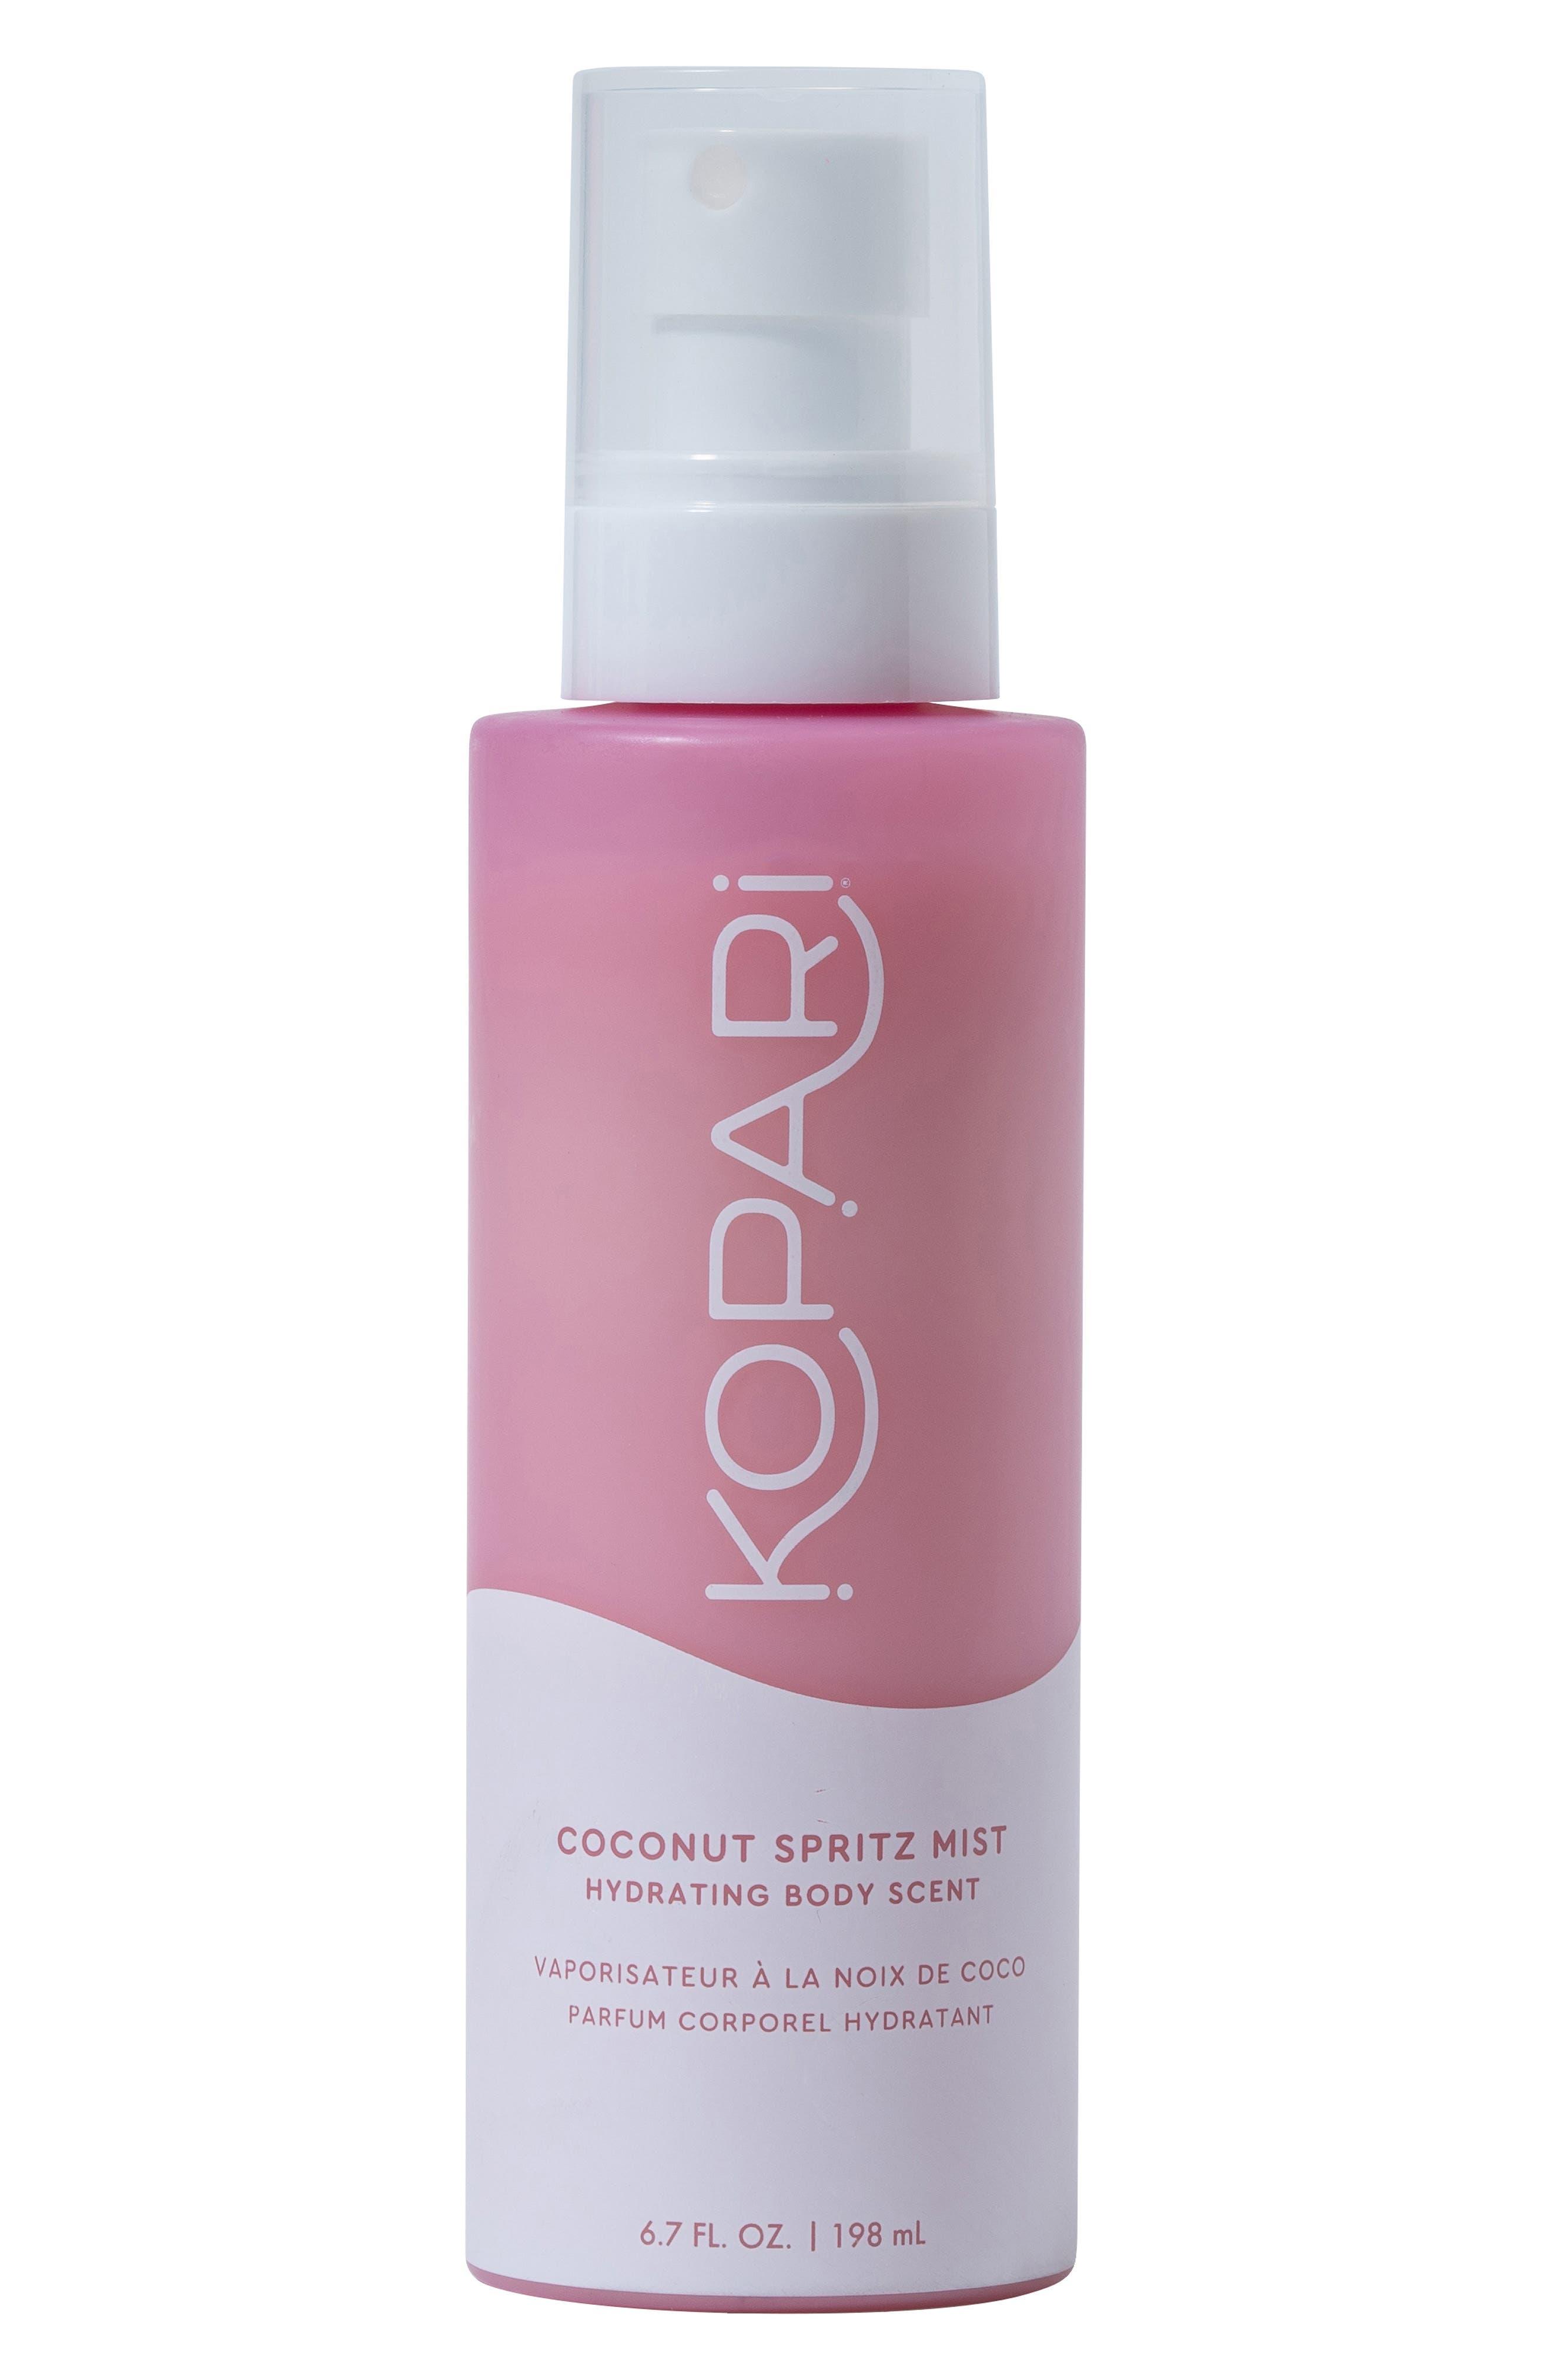 Coconut Spritz Body Mist